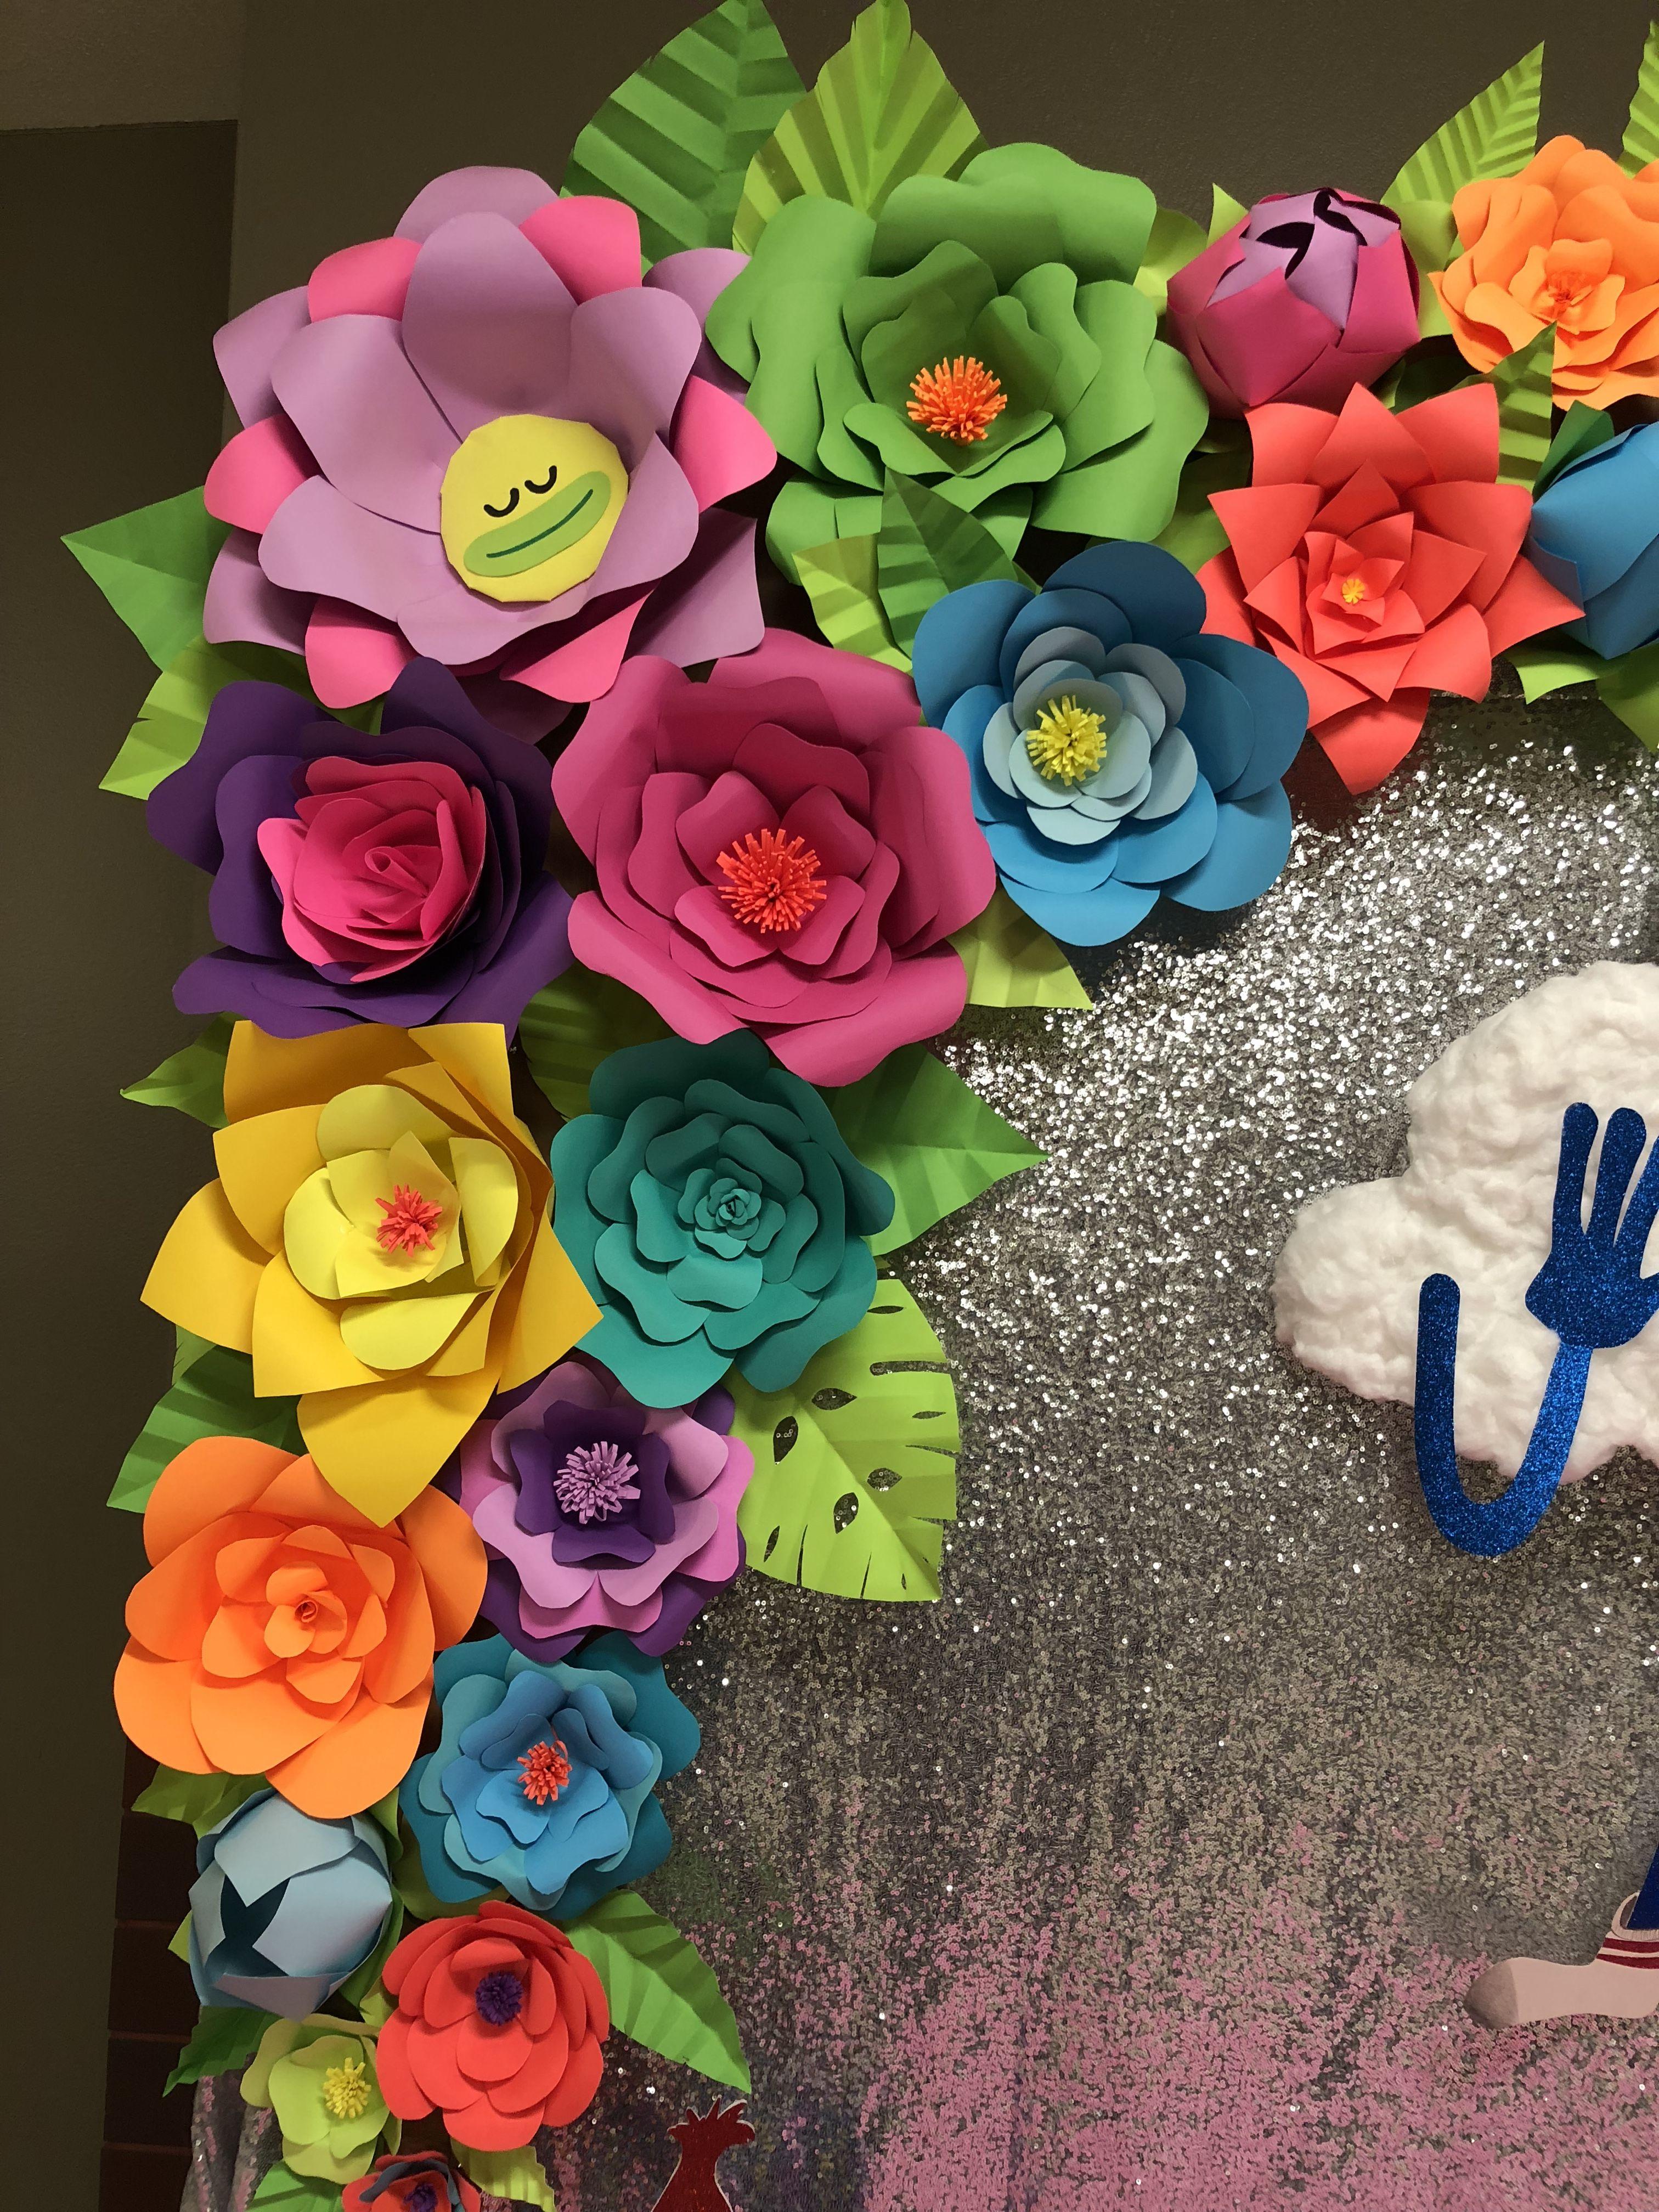 Trolls Diy Paper Flower Decorations Party Paper Flowers Trolls Birthday Party Trolls Birthday